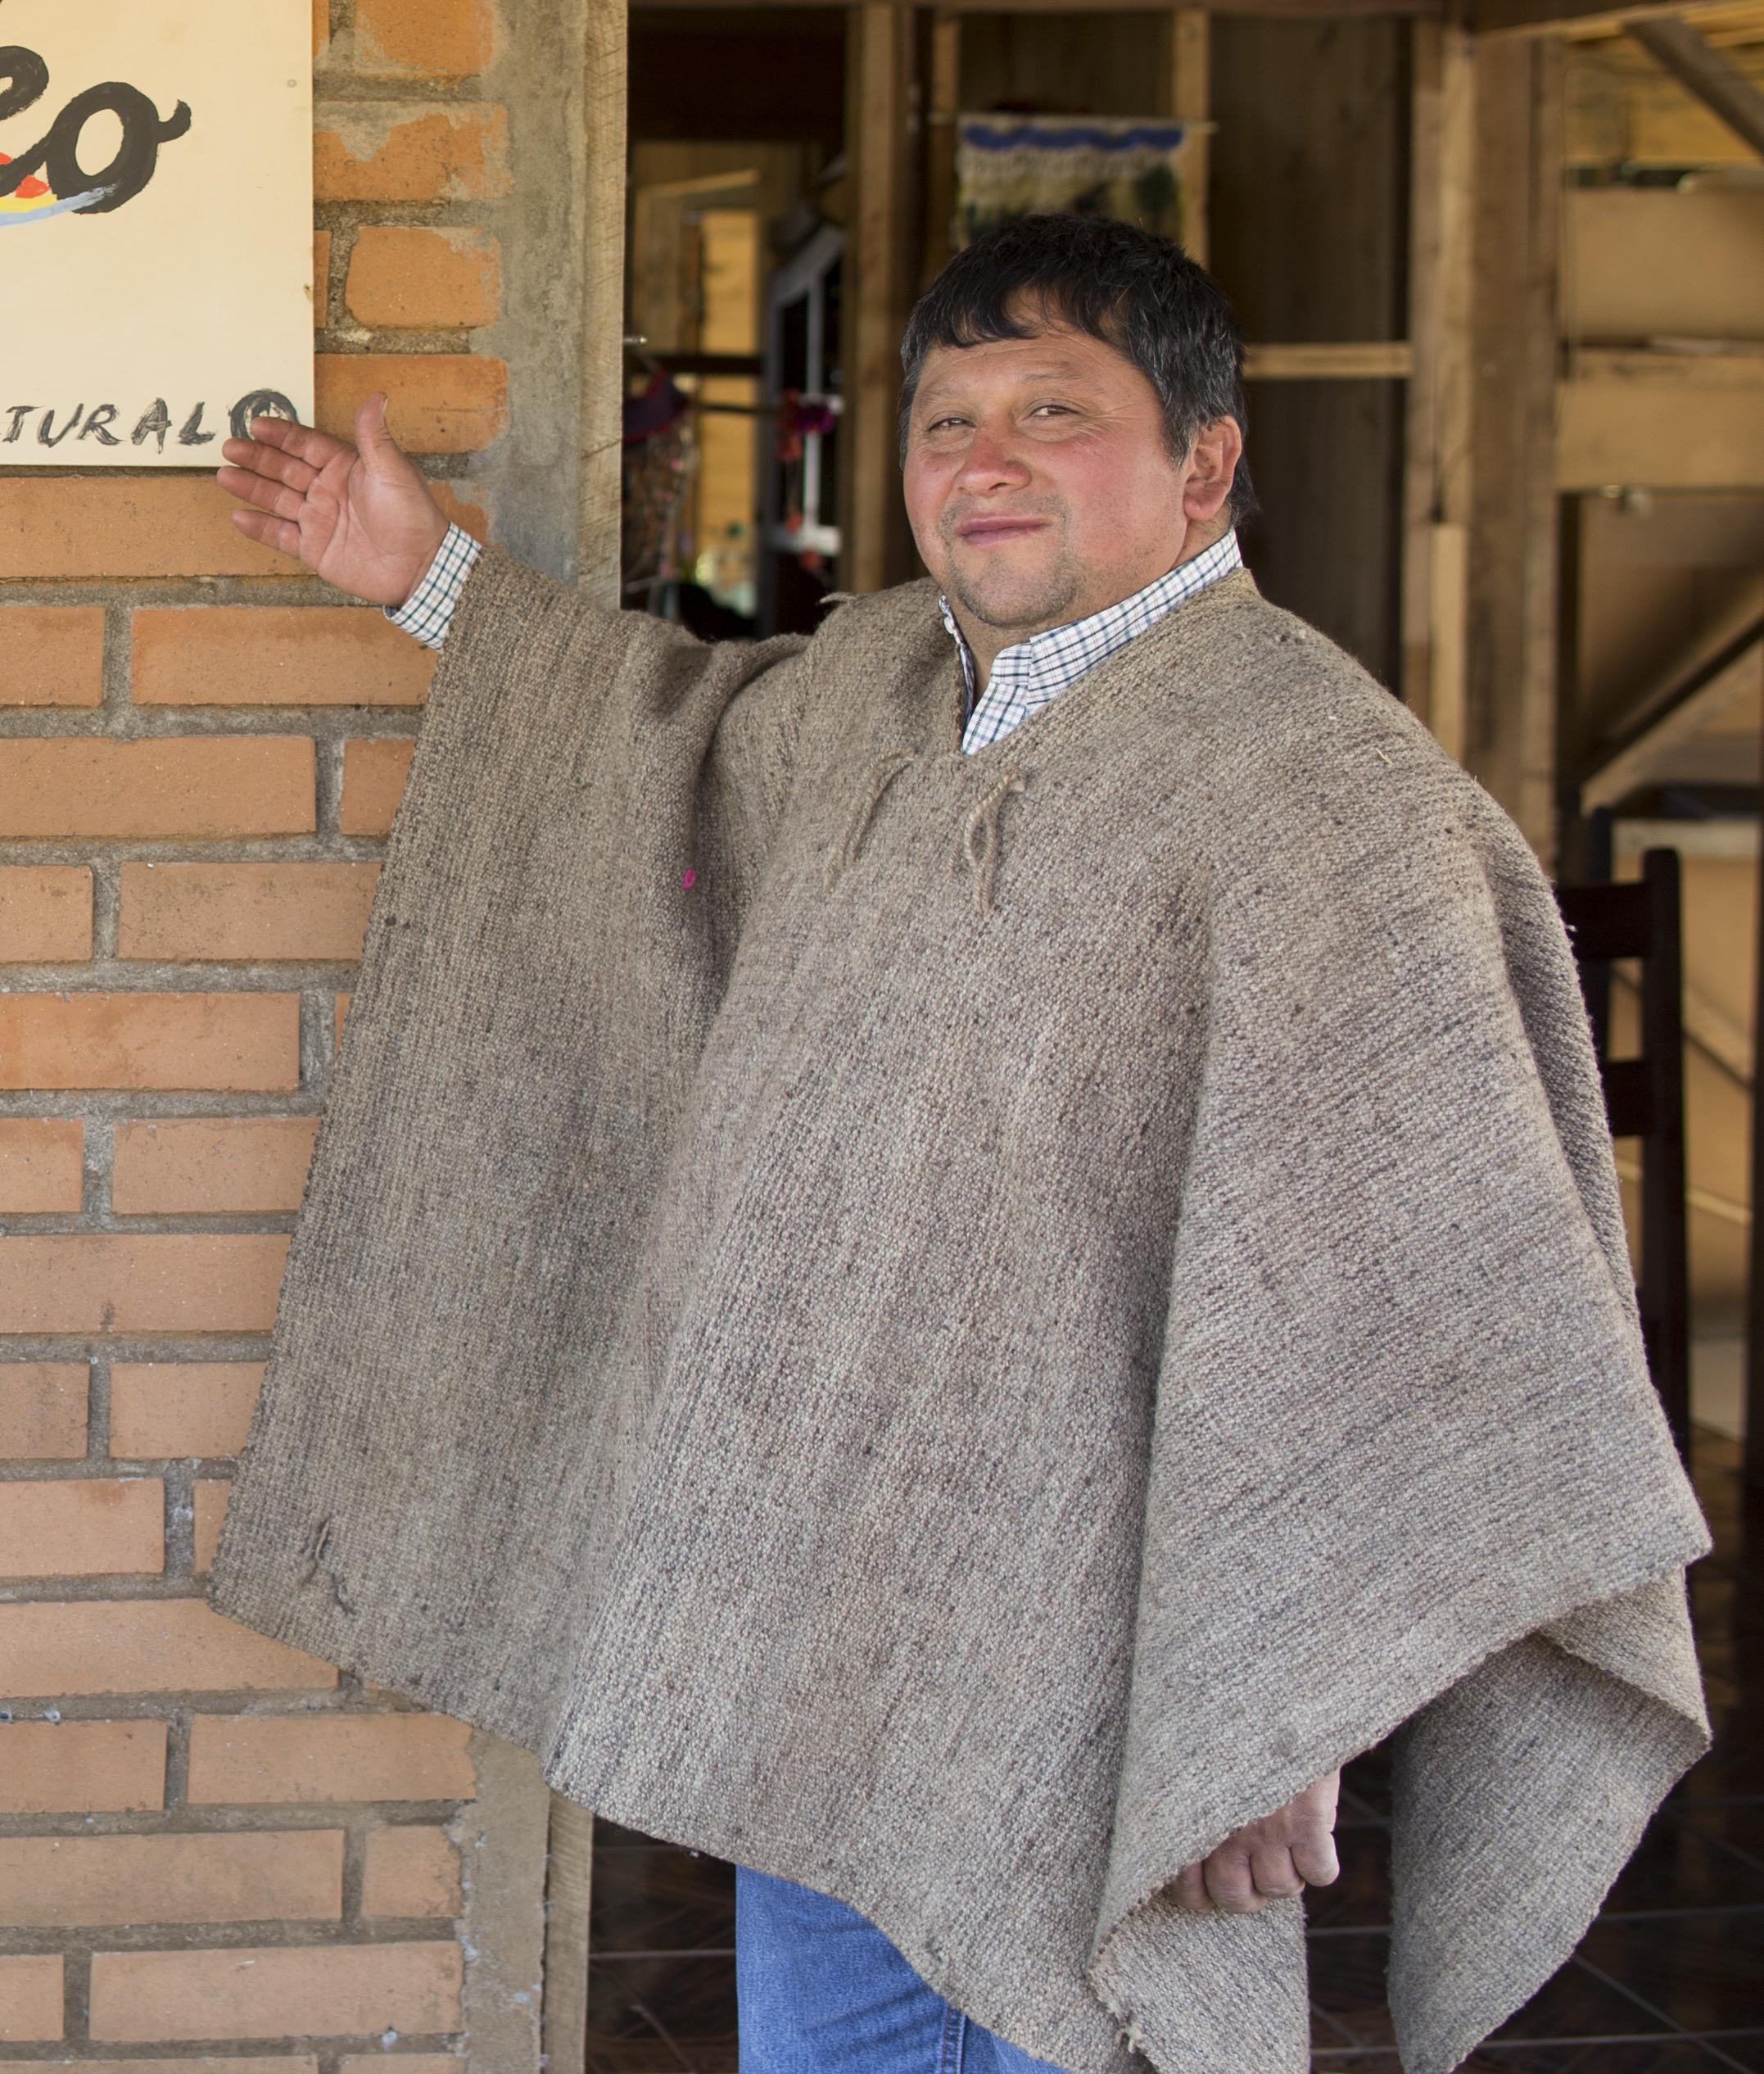 Gabriel Ernesto Antilao Catrimil